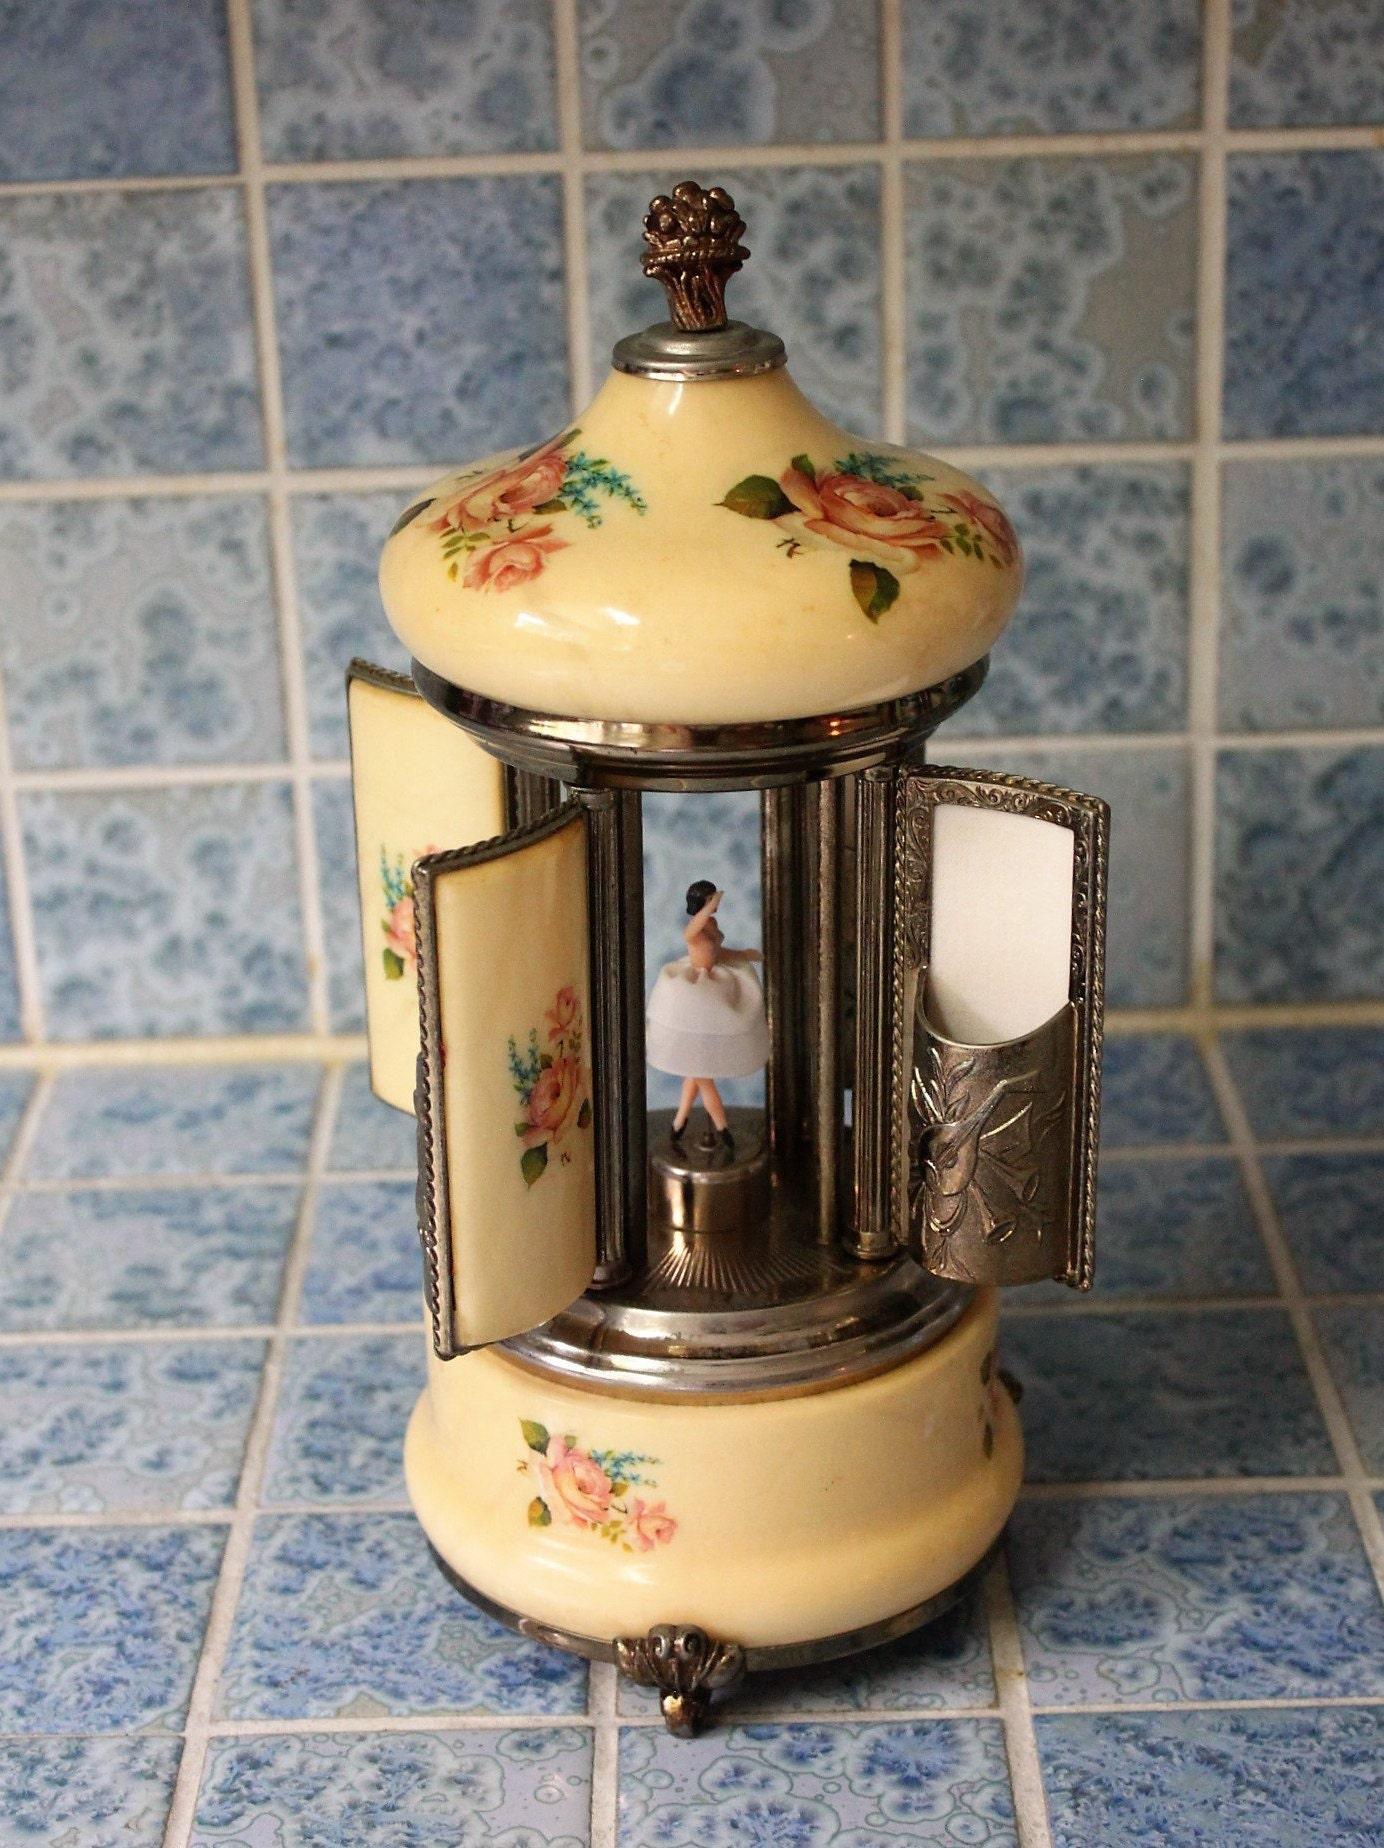 Vintage Reuge dancing ballerina music box